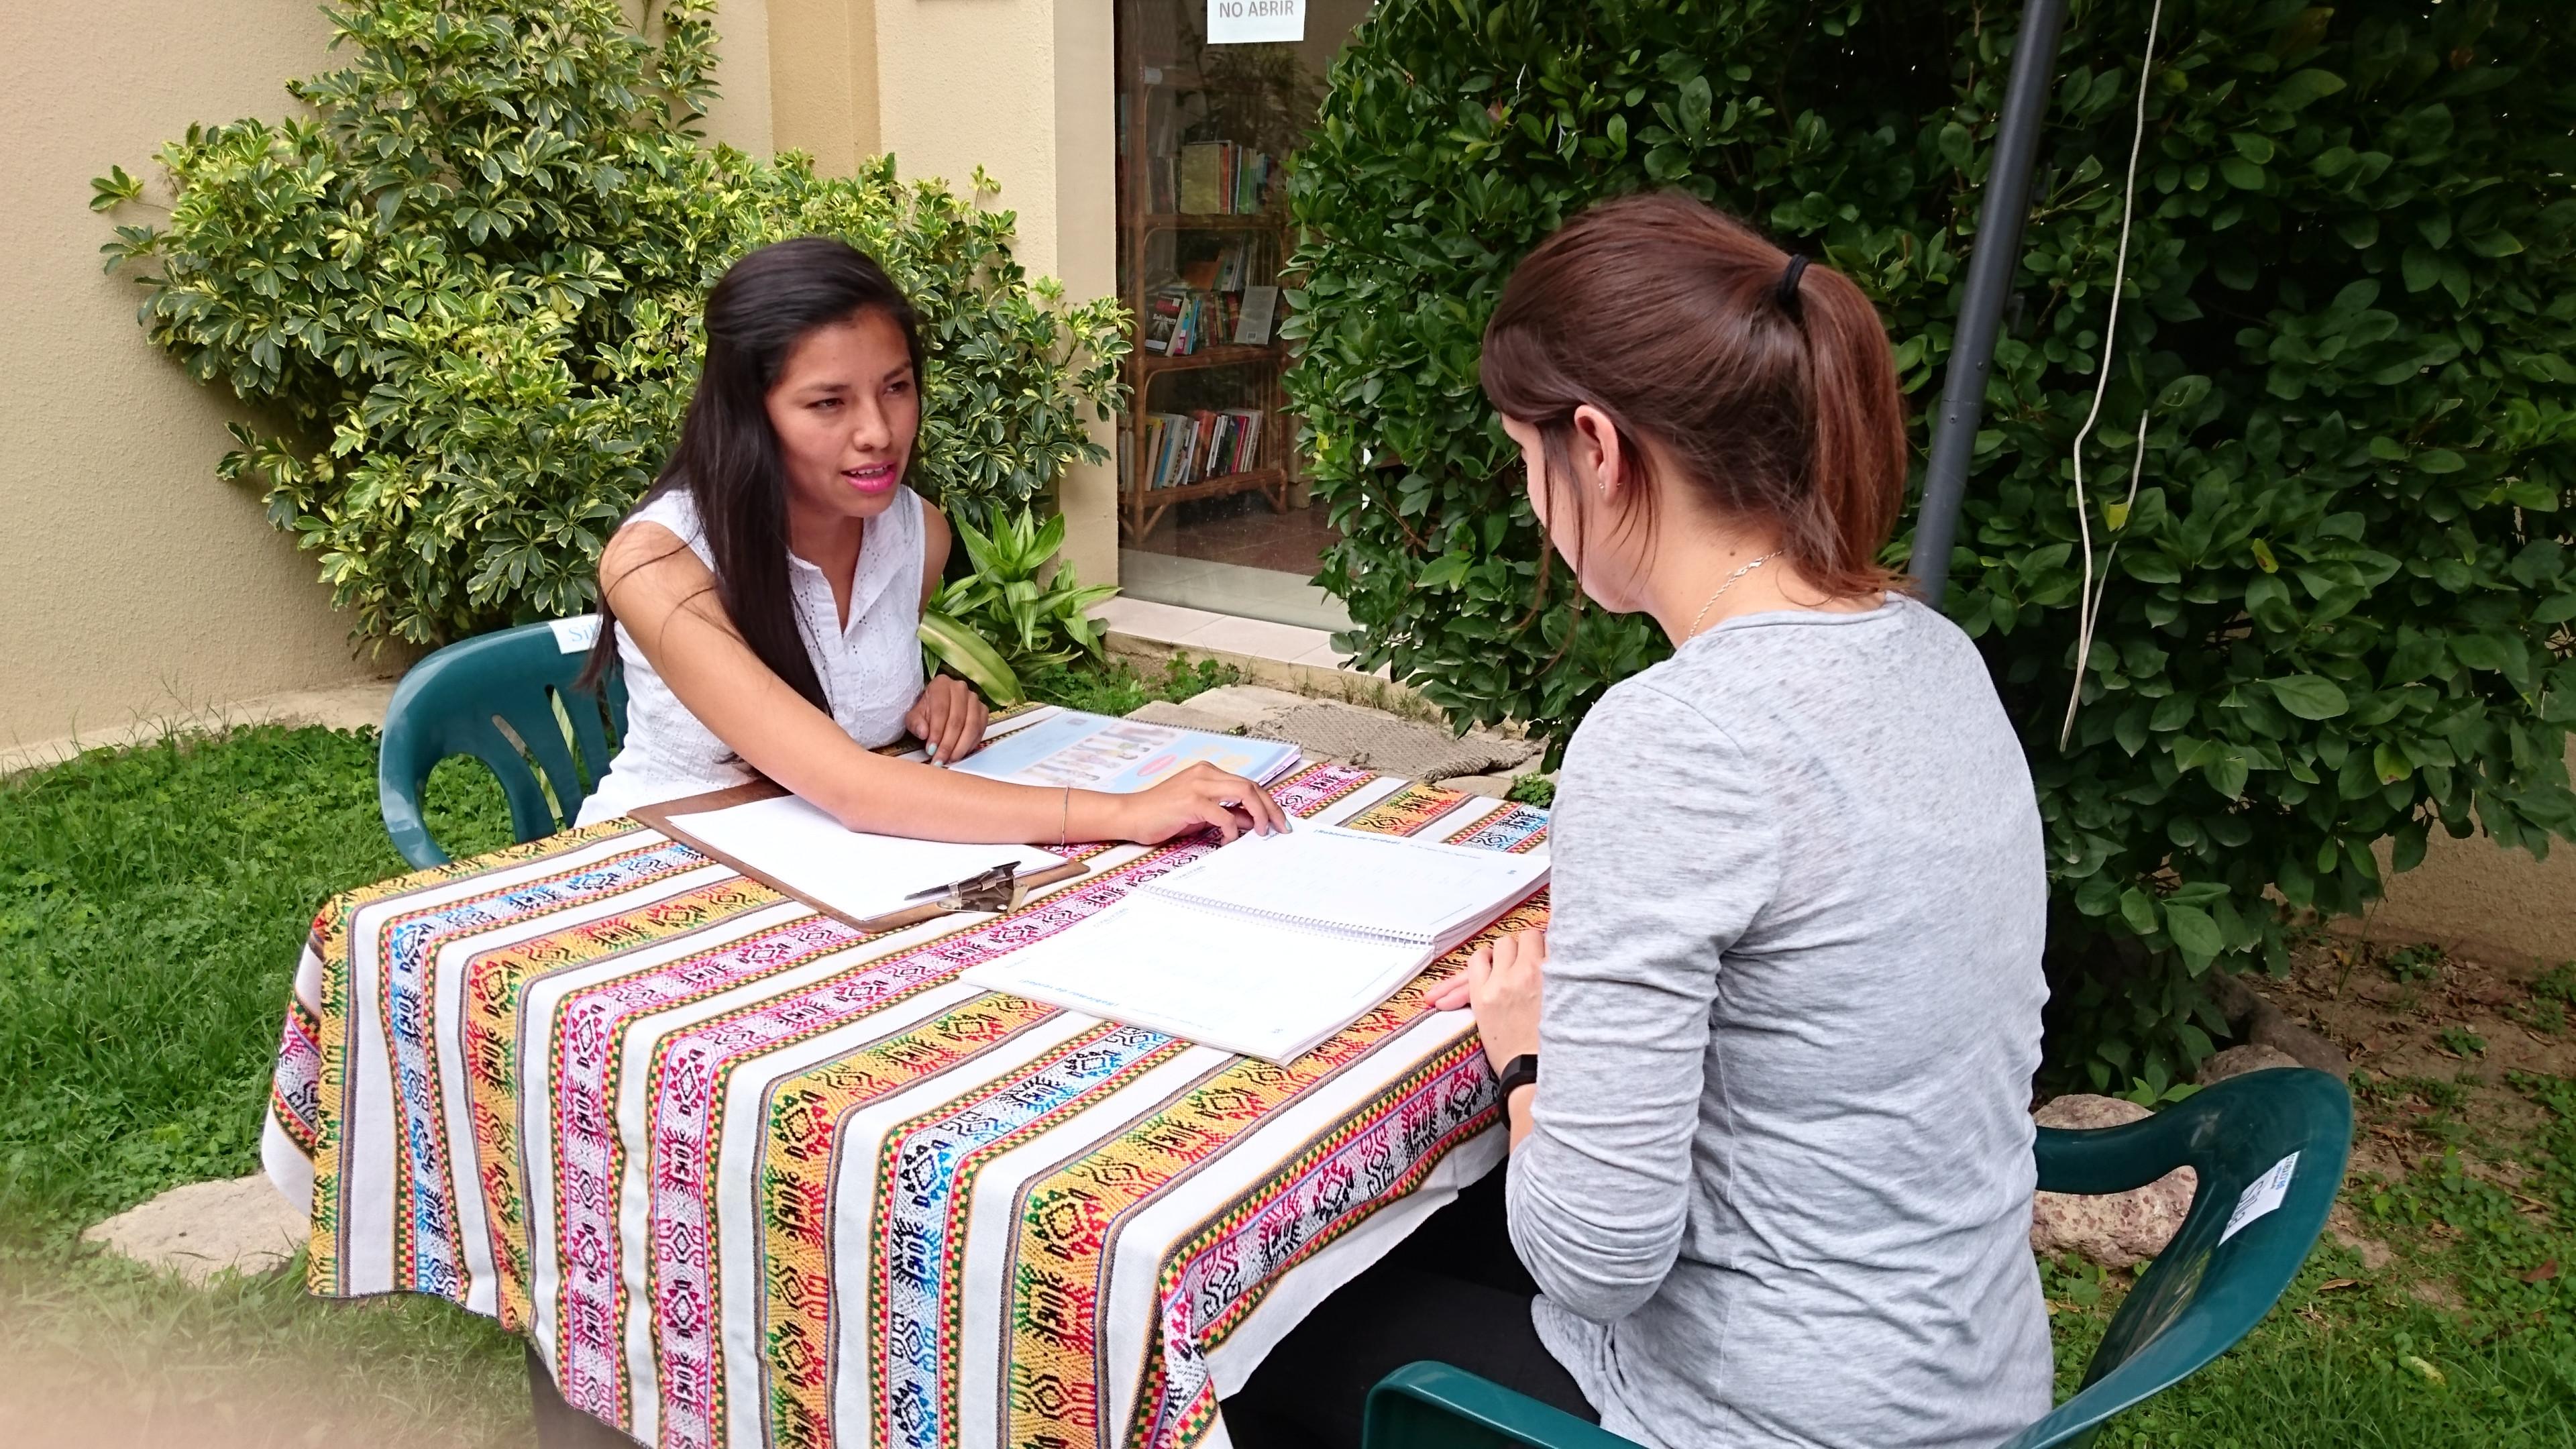 1 to 3 Language Classes per week